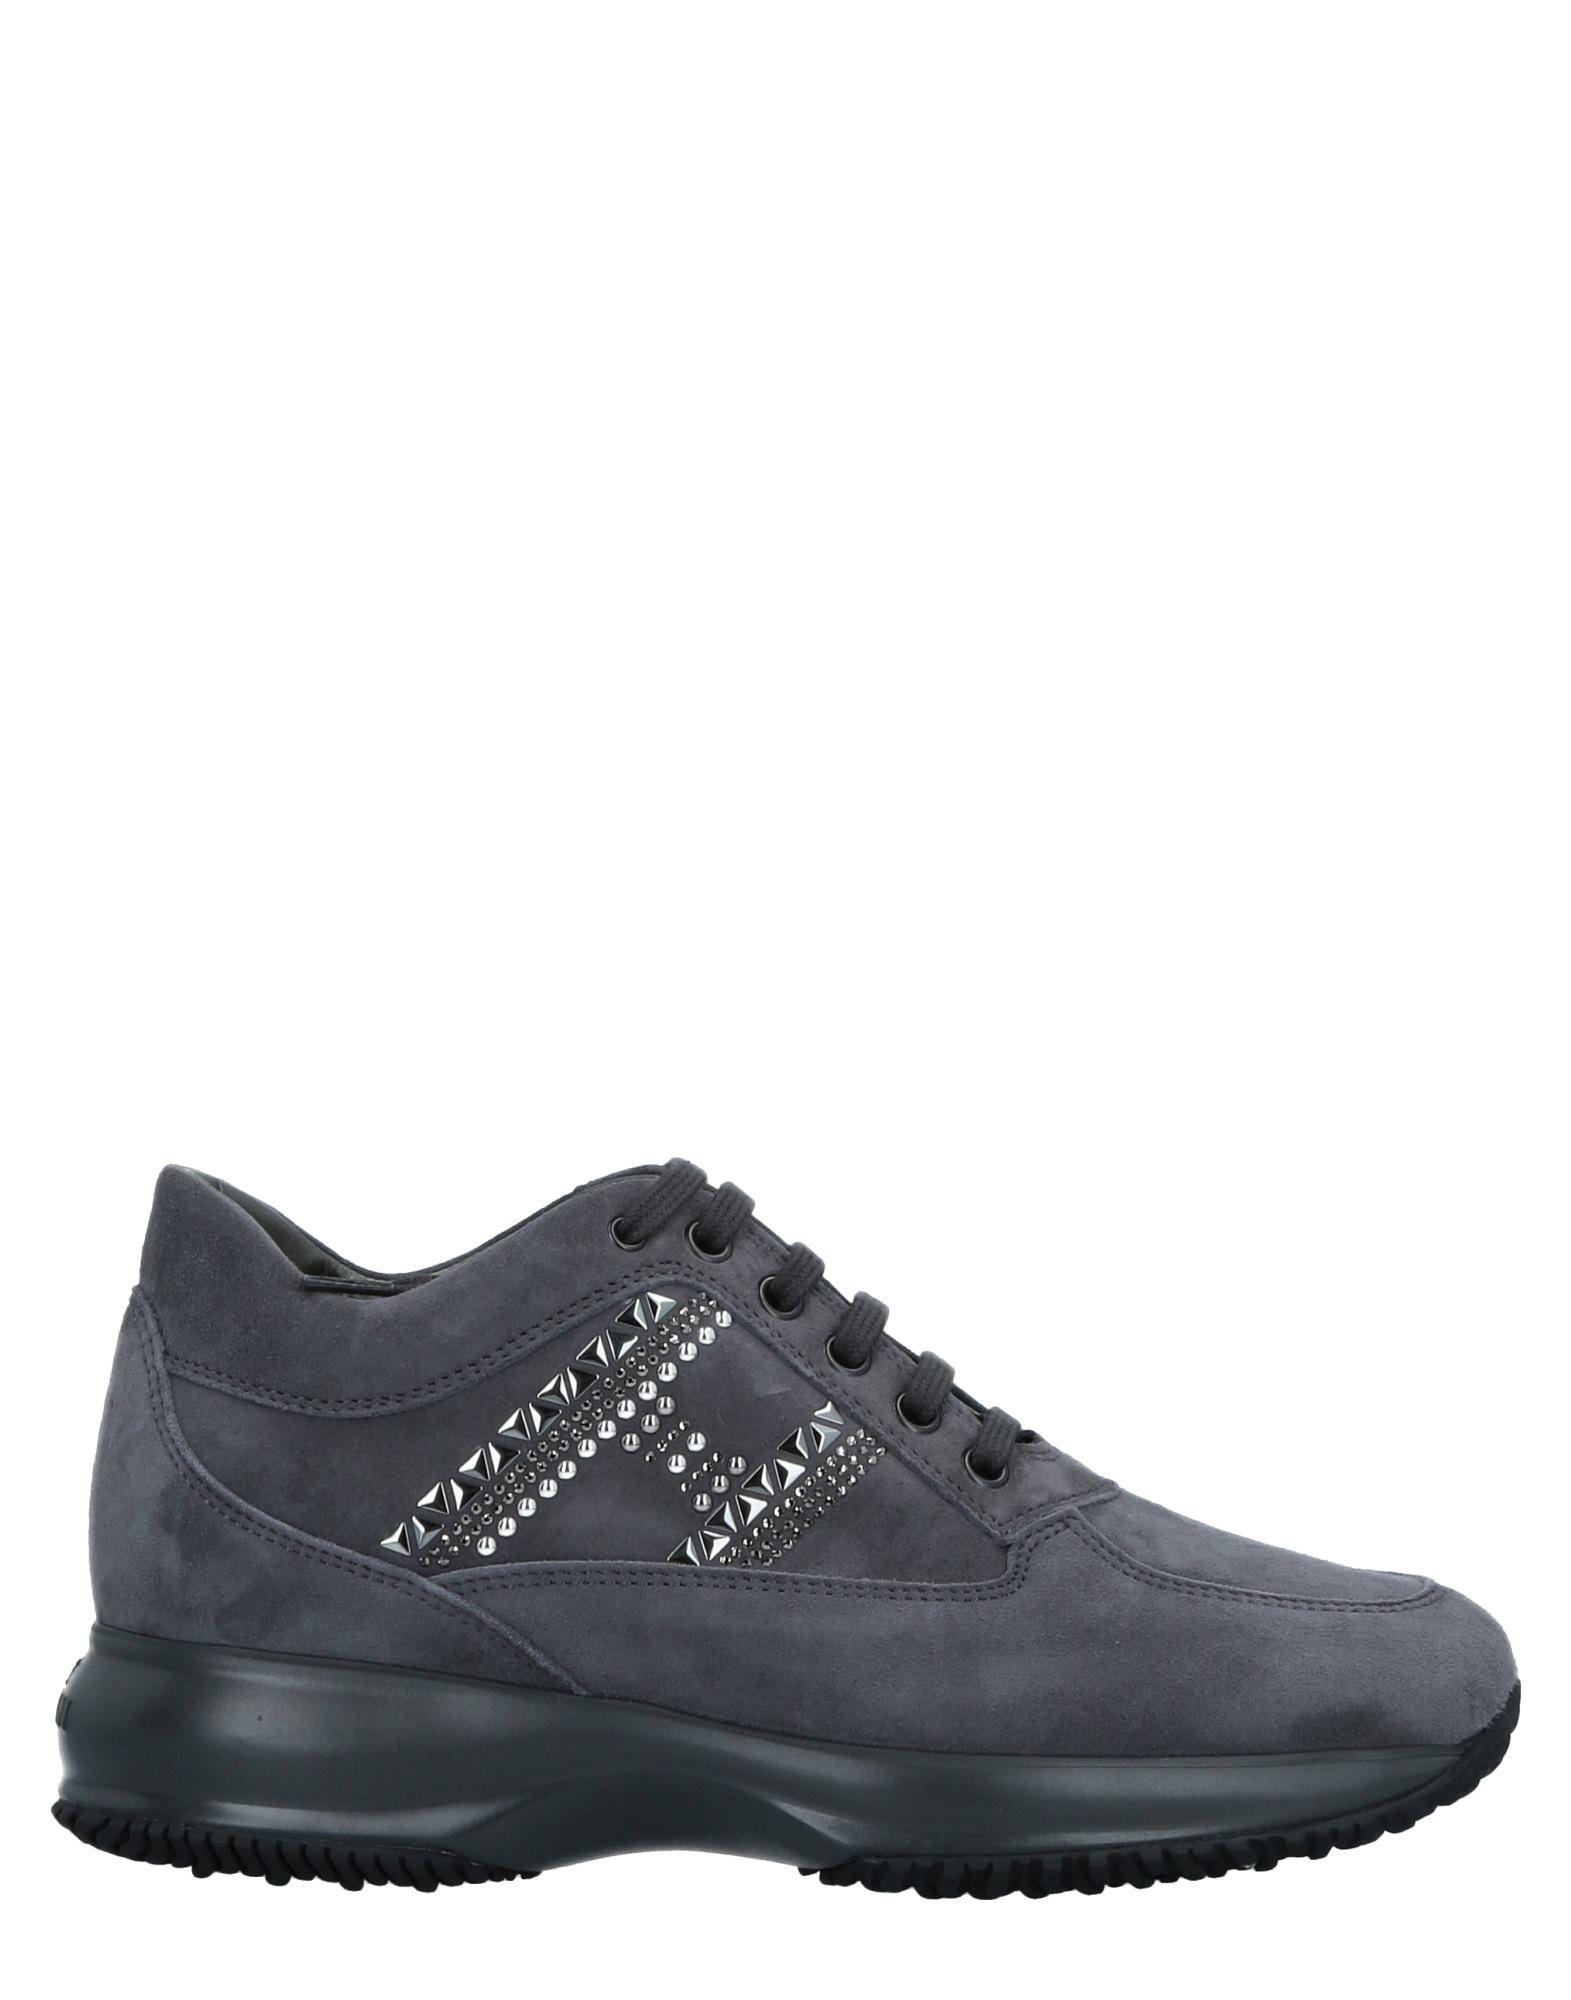 Hogan Sneakers Damen  11515099NEGut aussehende strapazierfähige Schuhe